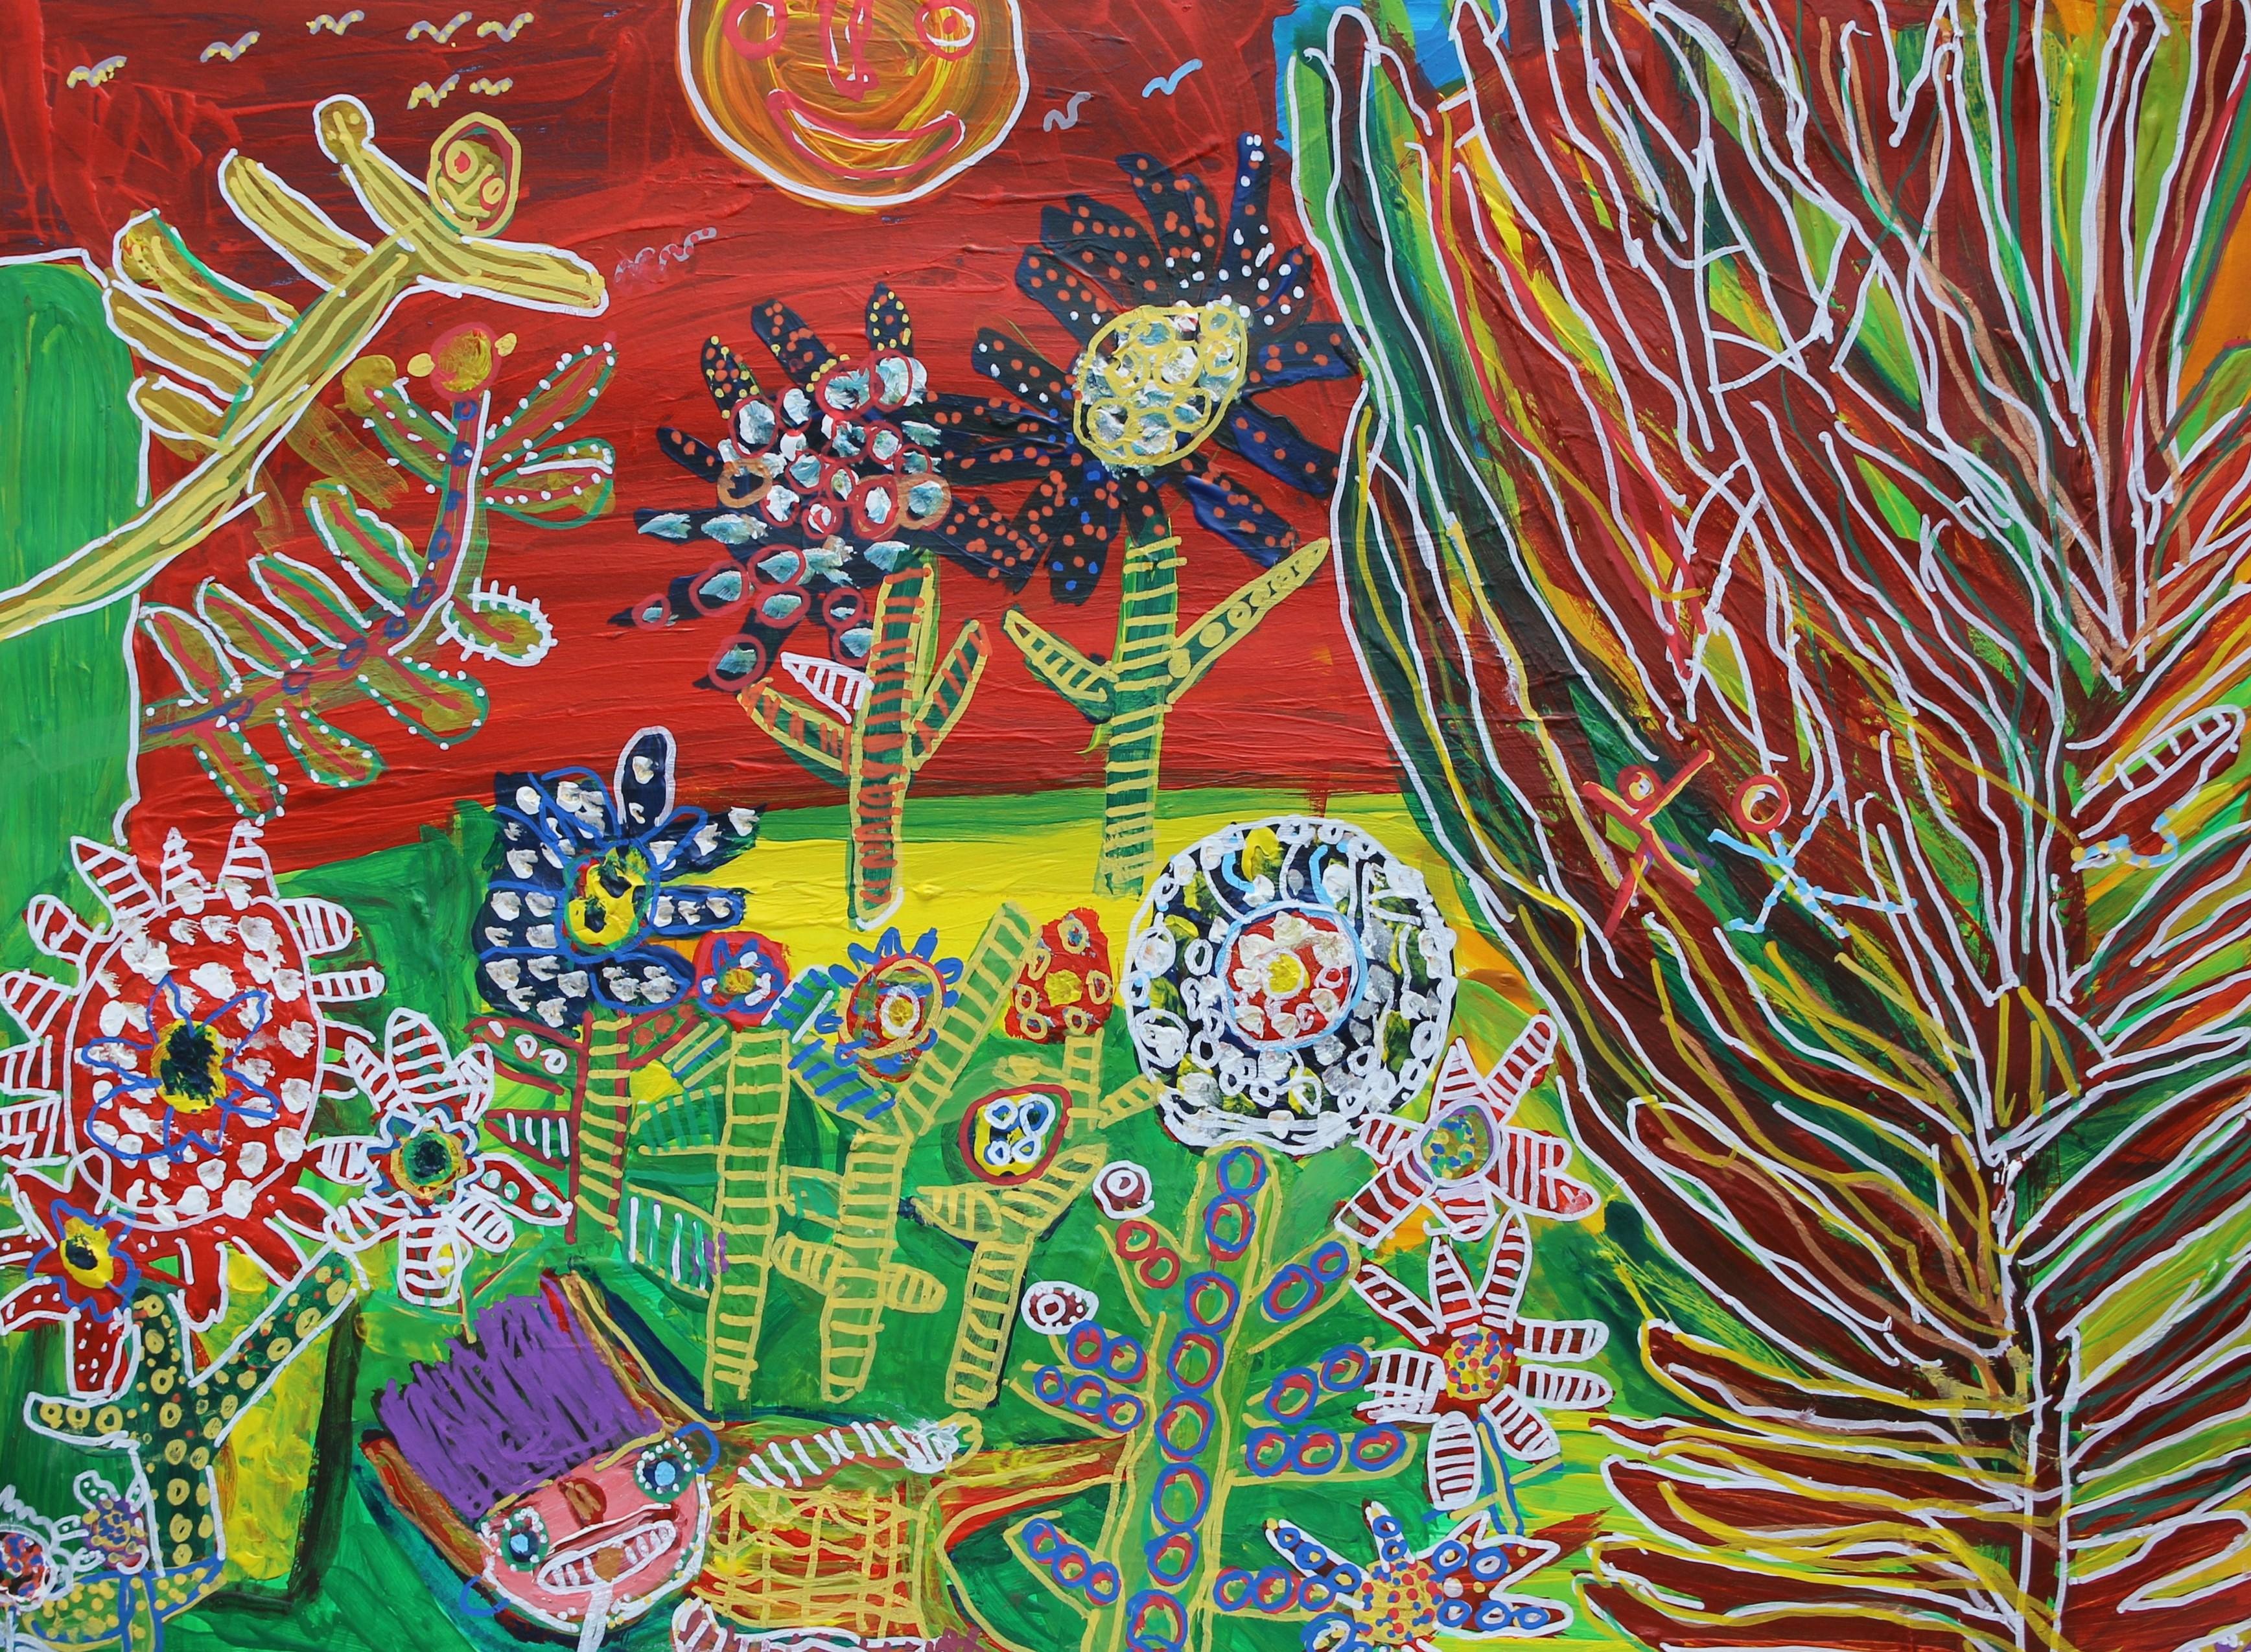 Flowers in Kildare, 2015, Lorna-Corrigan, 76cmX57cm